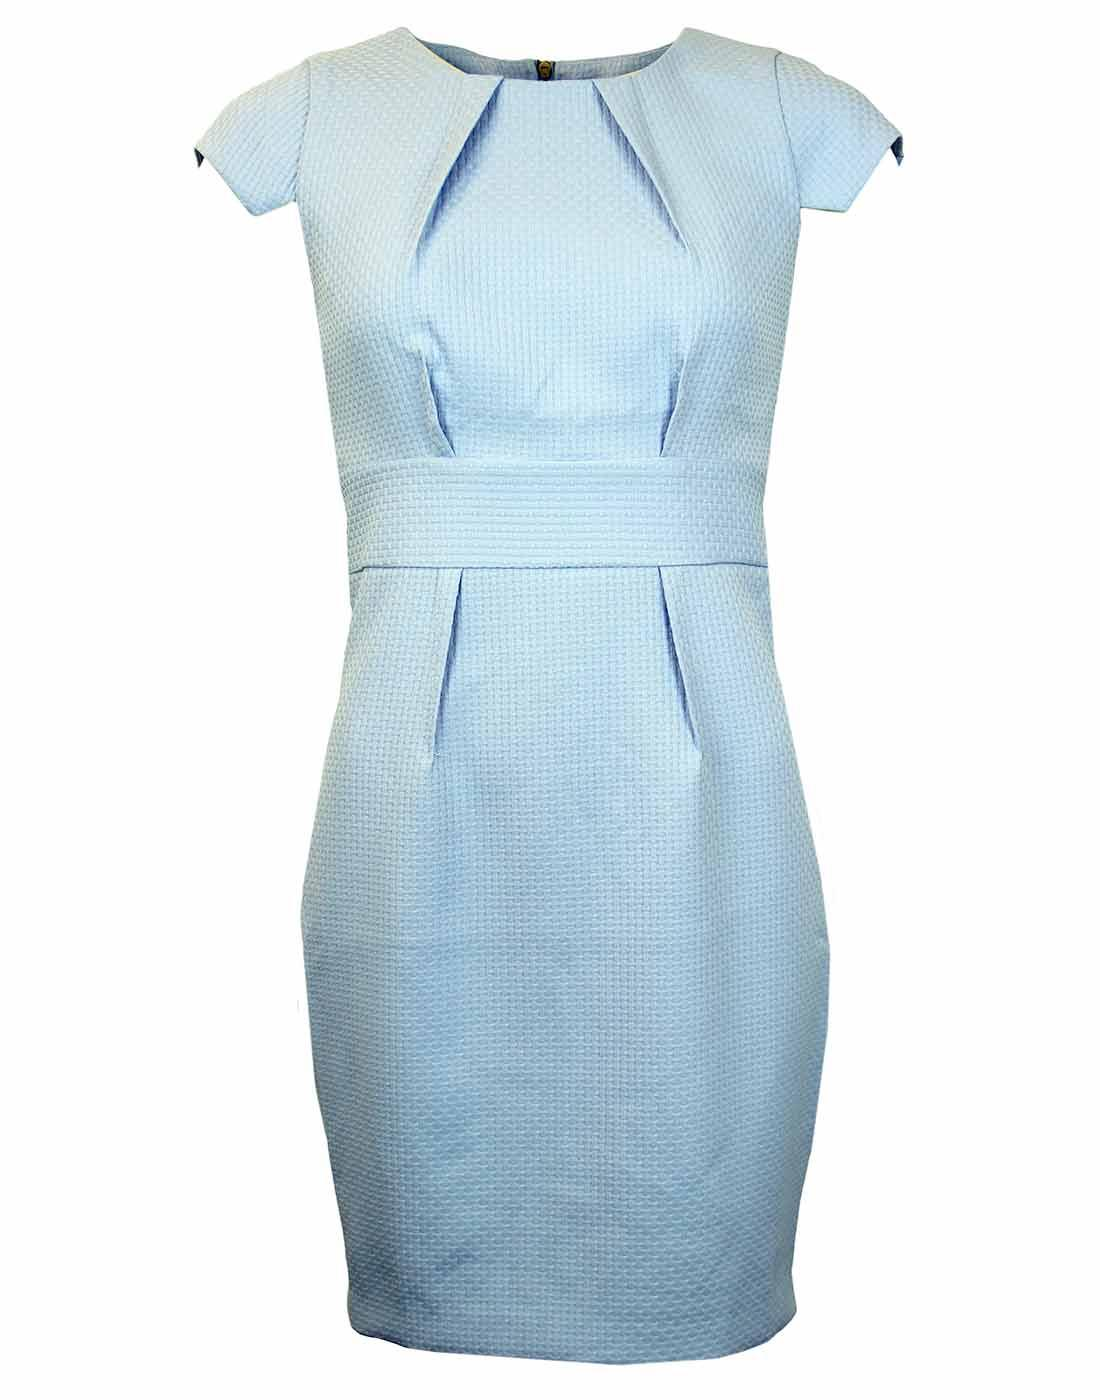 Esmay DARLING Retro 60's Structured Dress DB